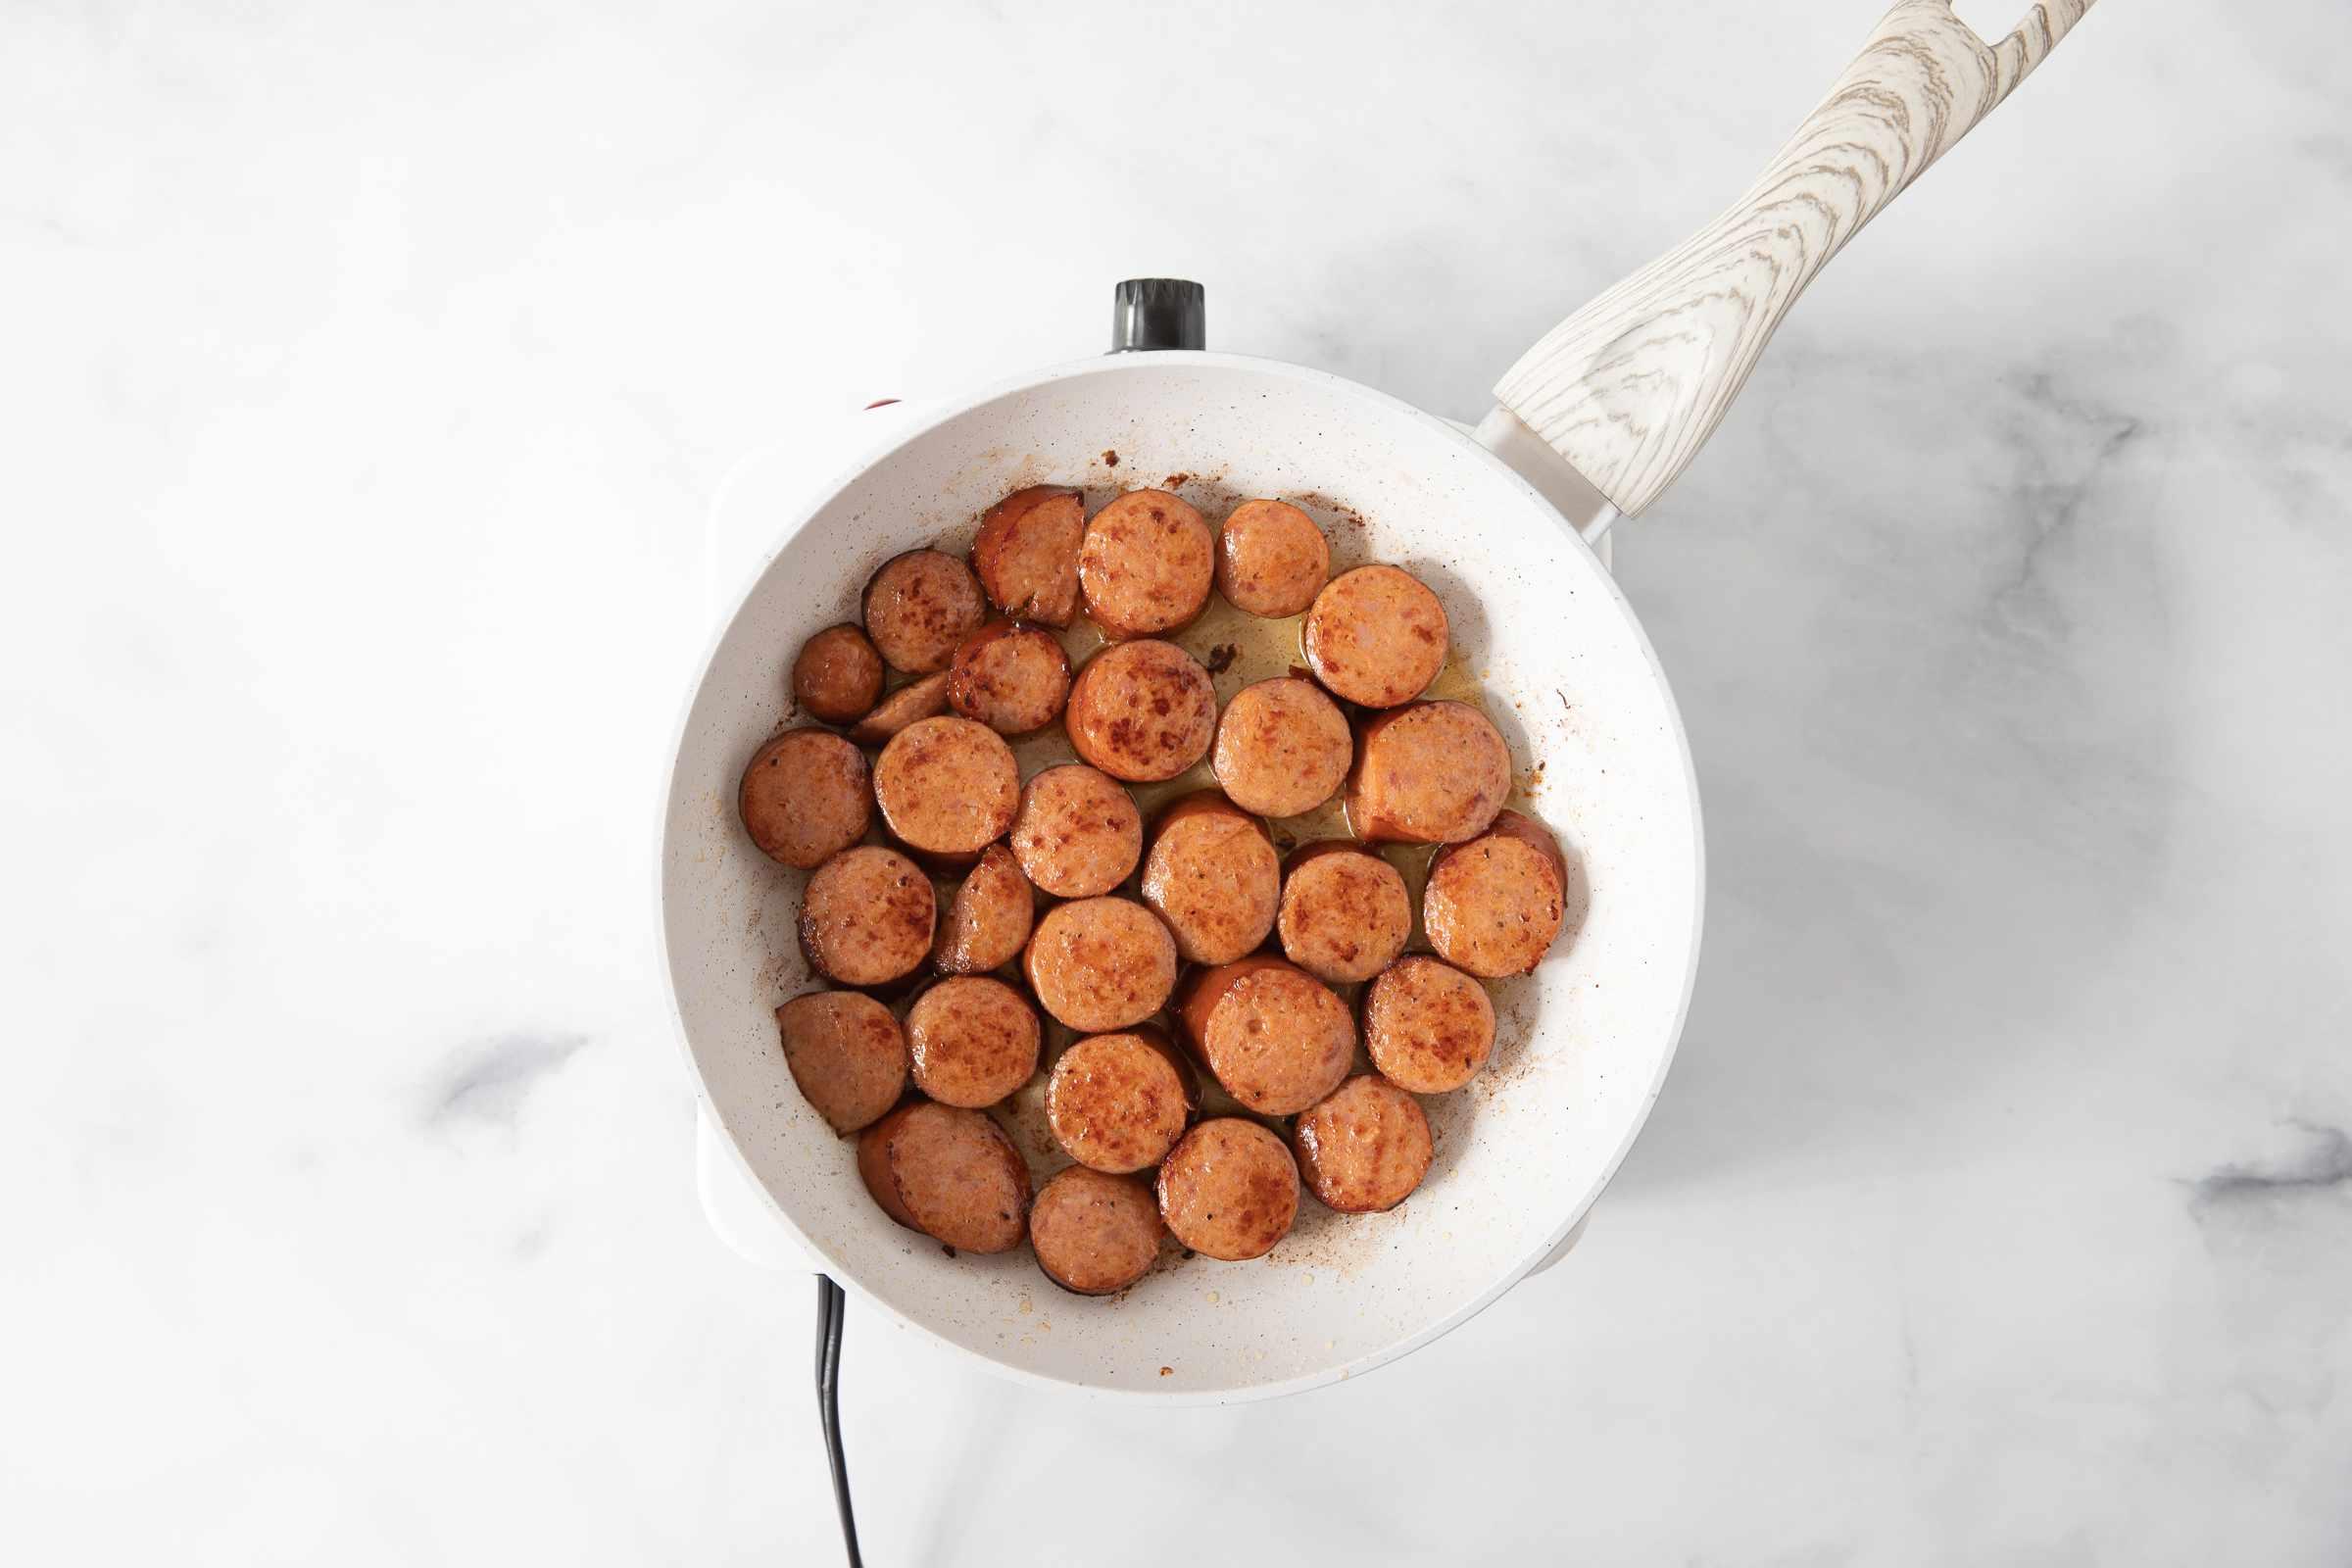 Brown sliced sausage in skillet